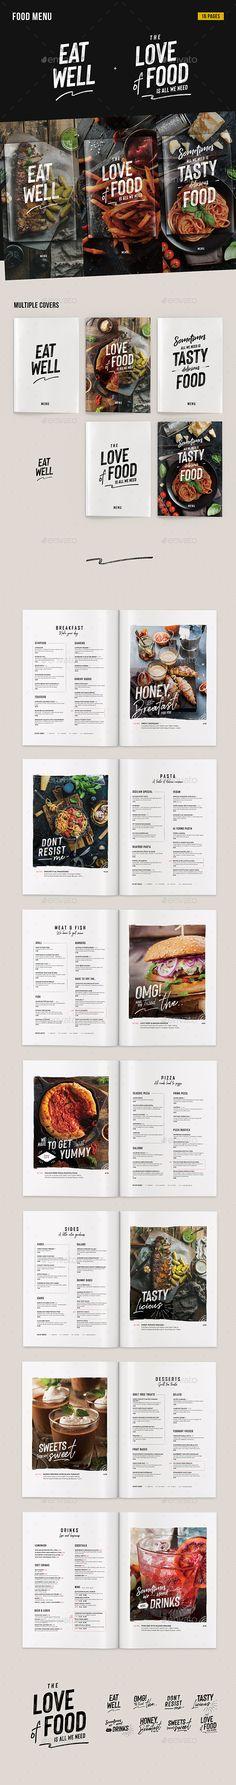 Food Menu. Customizable professional template for a restaurant flyer. #FlyerTemplate #flyer #restaurant #GraphicTemplate #design #PrintDesign #bakery #bar #bistro #breakfast #burger #cafe #club #desserts #drinks #DrinksMenu #food #FoodMenu #grill #italian #ItalianMenu #lounge #menu #pasta #pizza #PizzaMenu #pub #RestaurantMenu #steak #typography #vintage Restaurant Menu Template, Restaurant Flyer, Breakfast Burger, Breakfast Menu, Desserts Menu, Food Menu, Pasta Menu, Italian Menu, Drink Menu